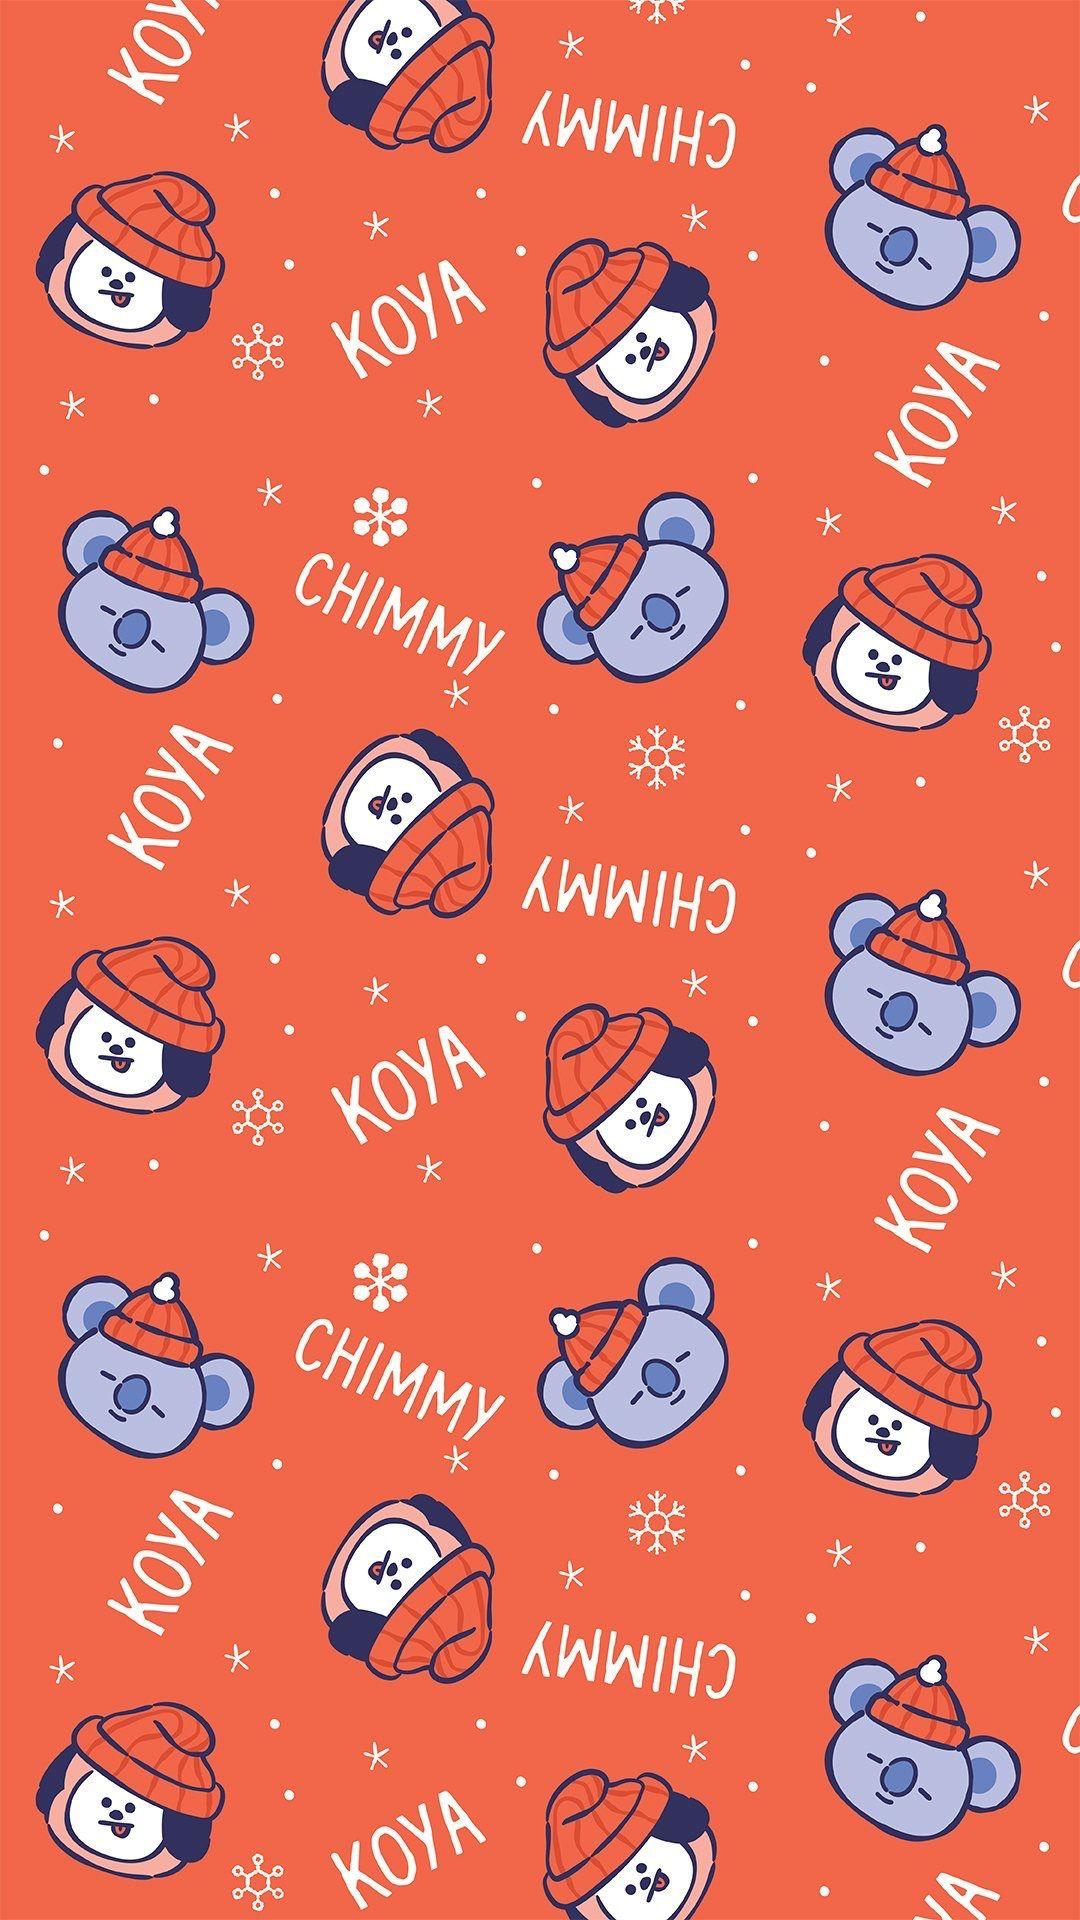 Bt21 Christmas Wallpaper Bt21 Koya Chimmy Wallpaper Bts Christmas Bts Wallpaper Iphone Wallpaper